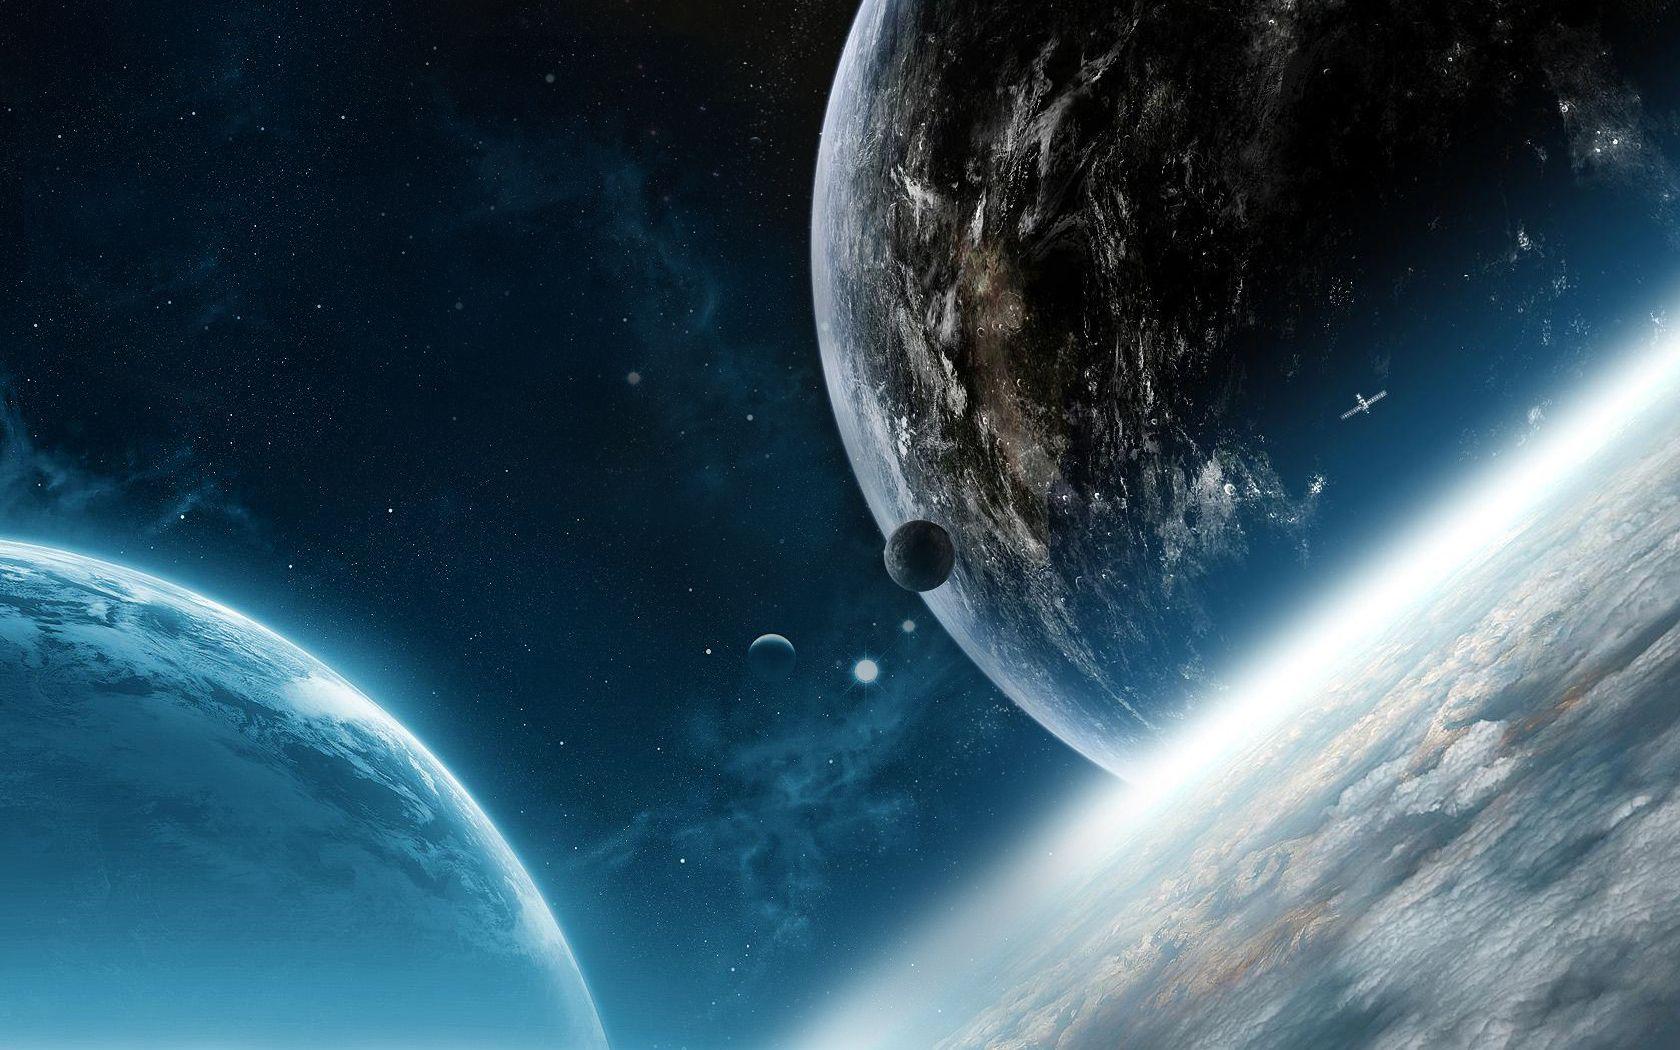 Sci Fi Wallpapers Free Download wallpaper